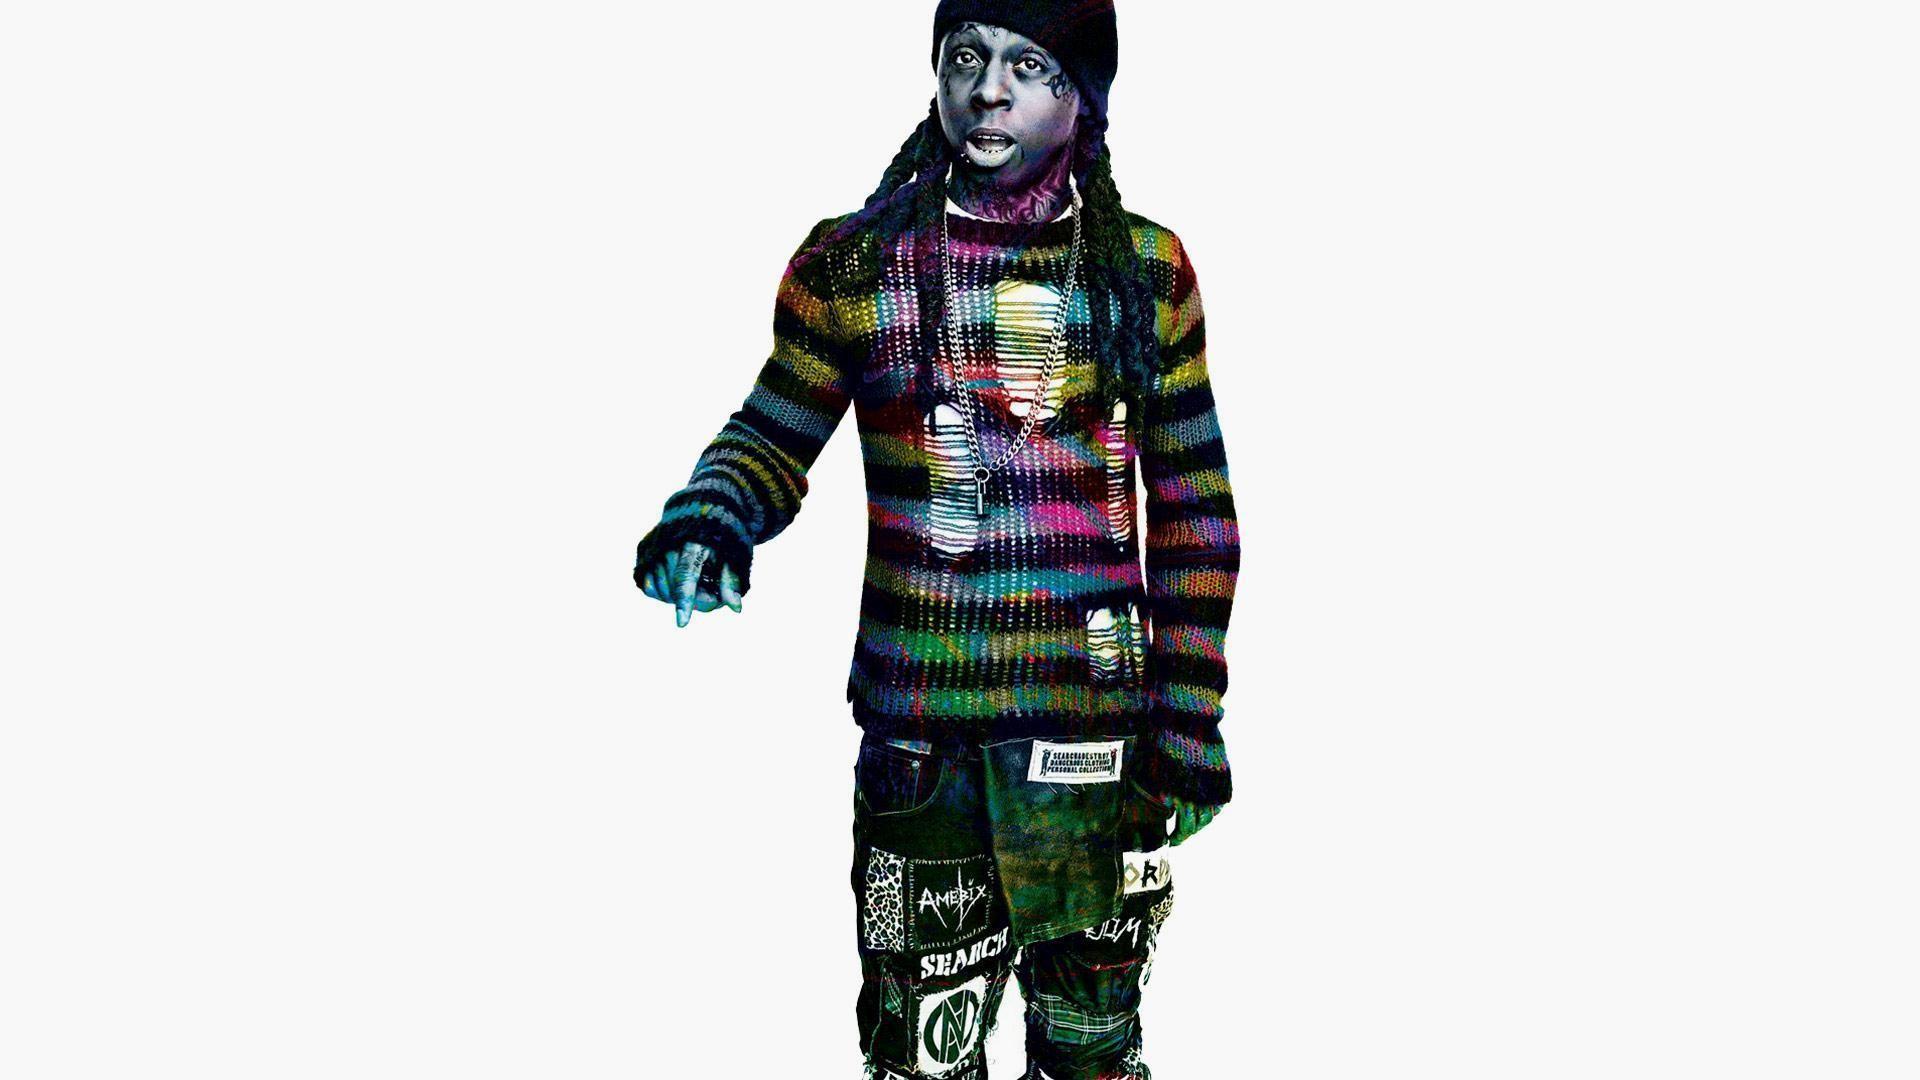 Wondrous Little Wayne Backgrounds Lil Wayne Iphone Iphone Wallpaper Lil Funny Birthday Cards Online Elaedamsfinfo